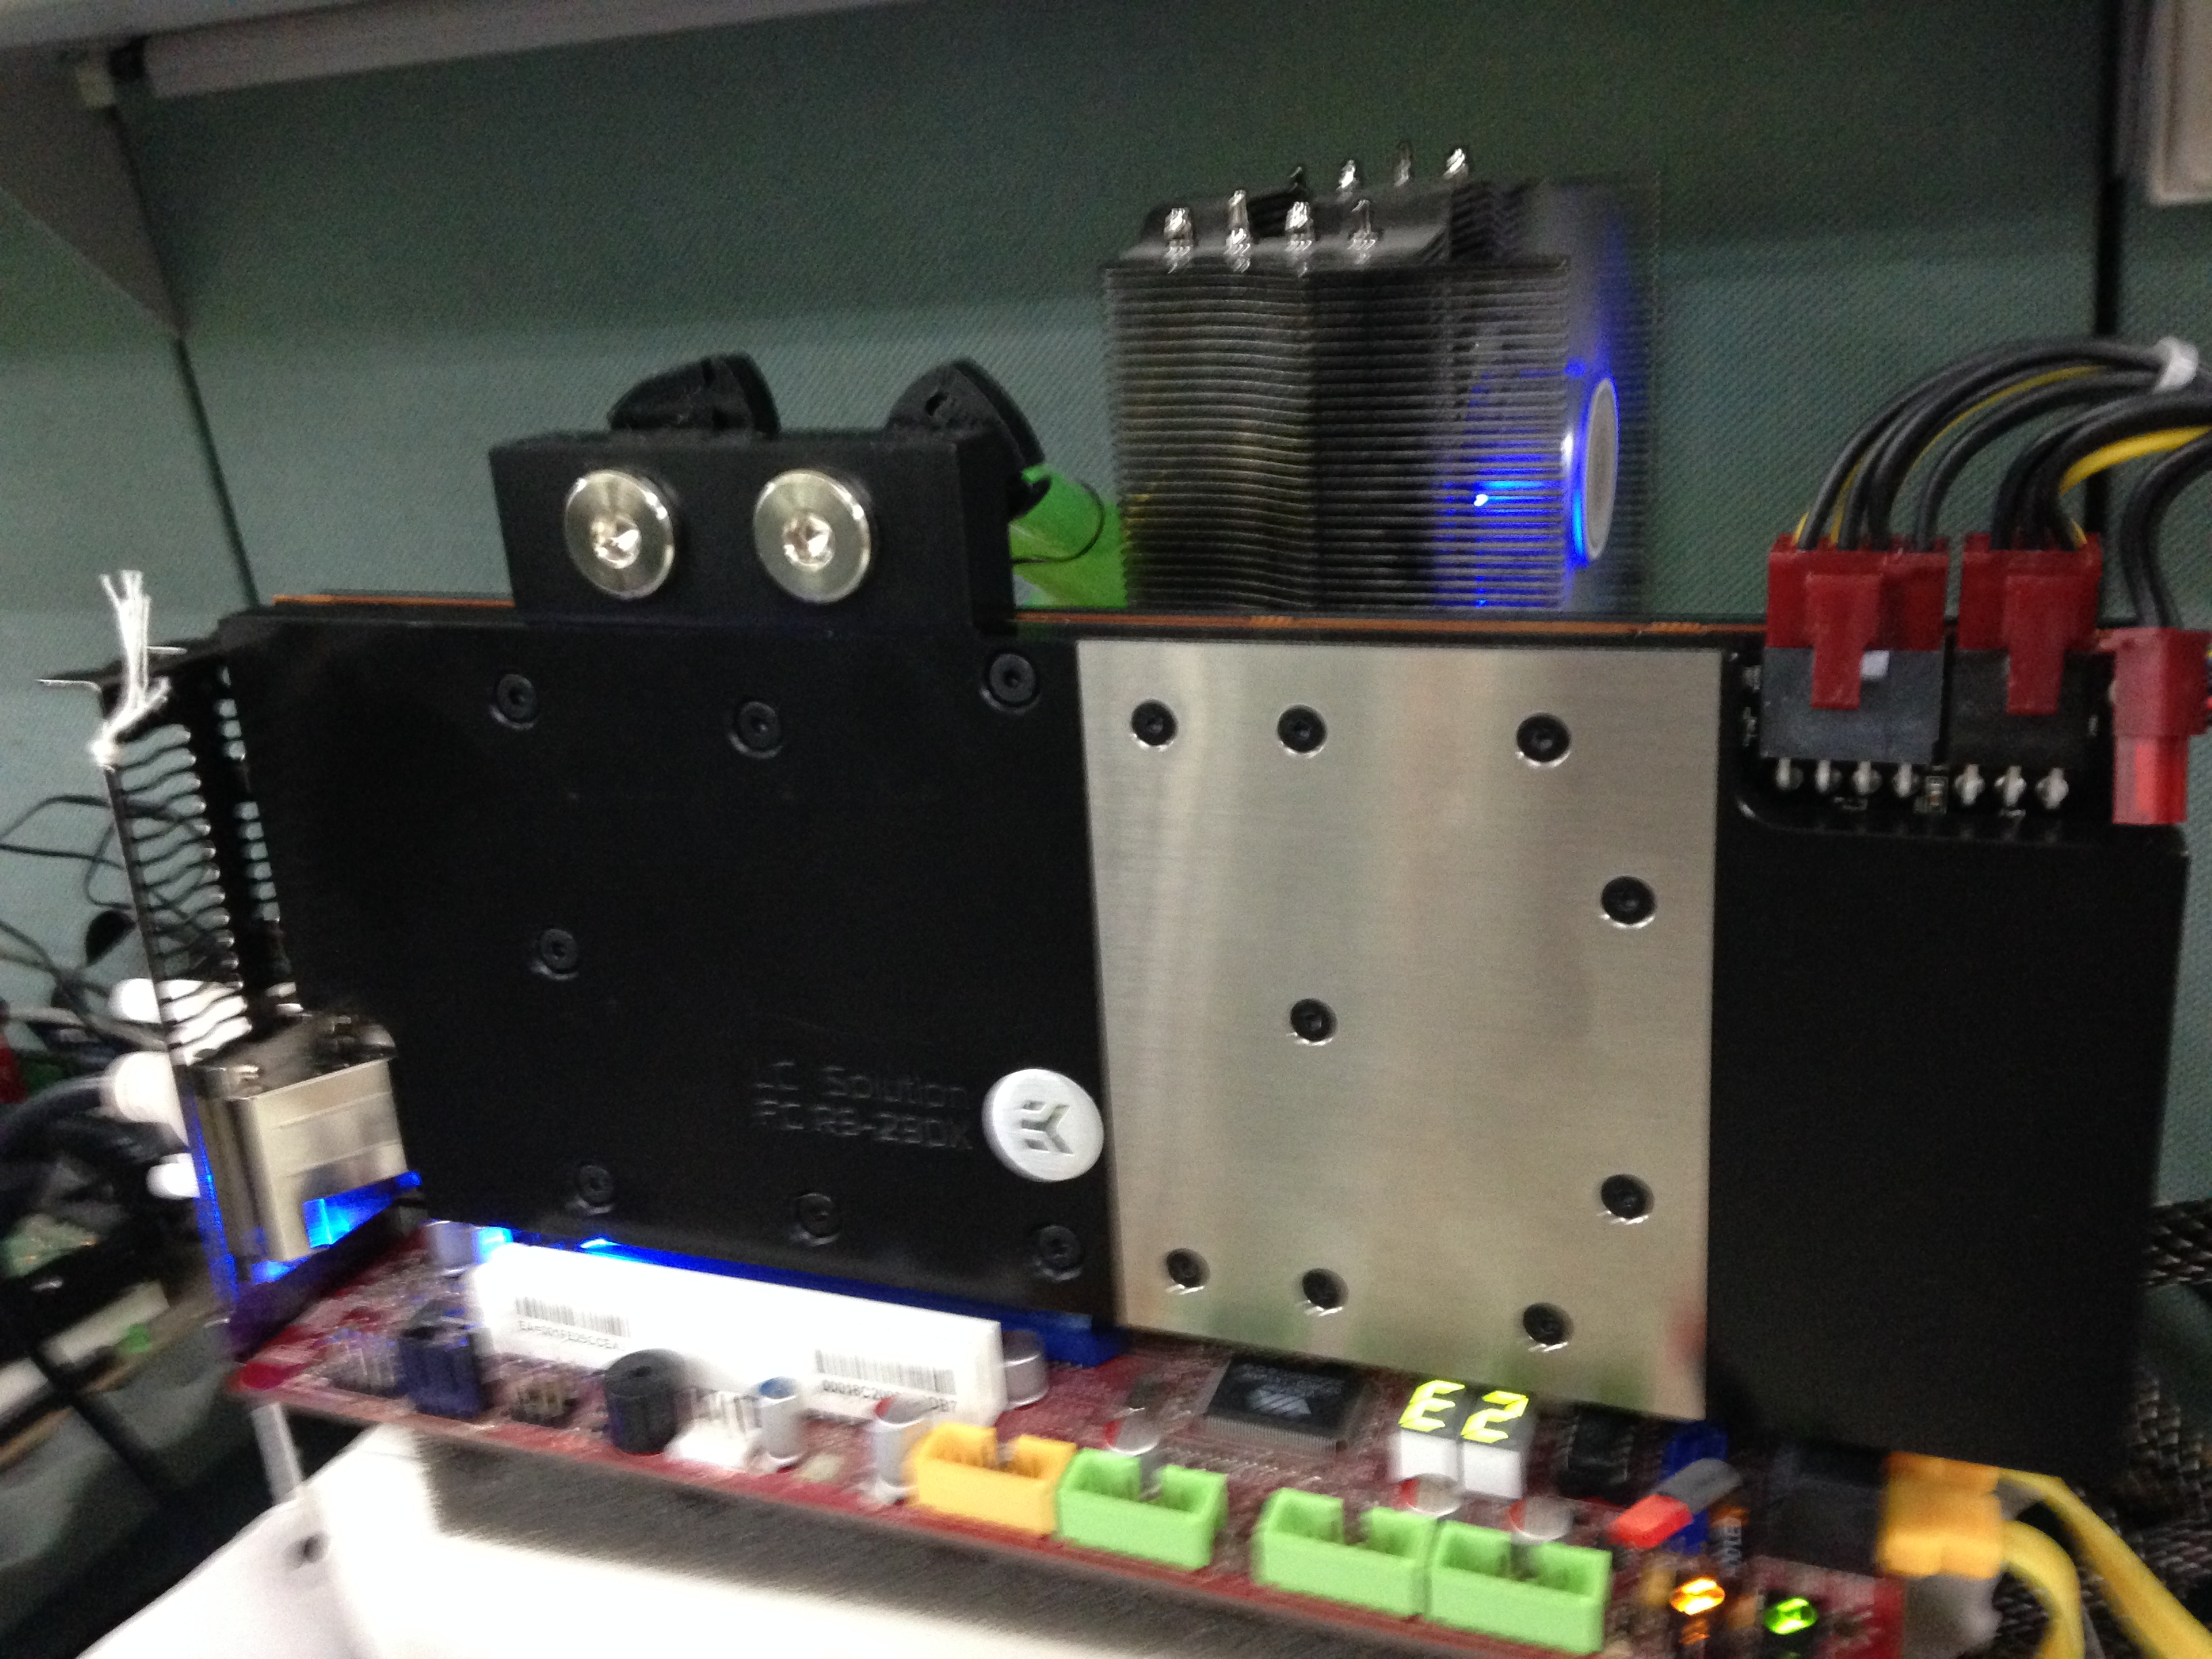 PowerColor Radeon R9 290X LCS (1)